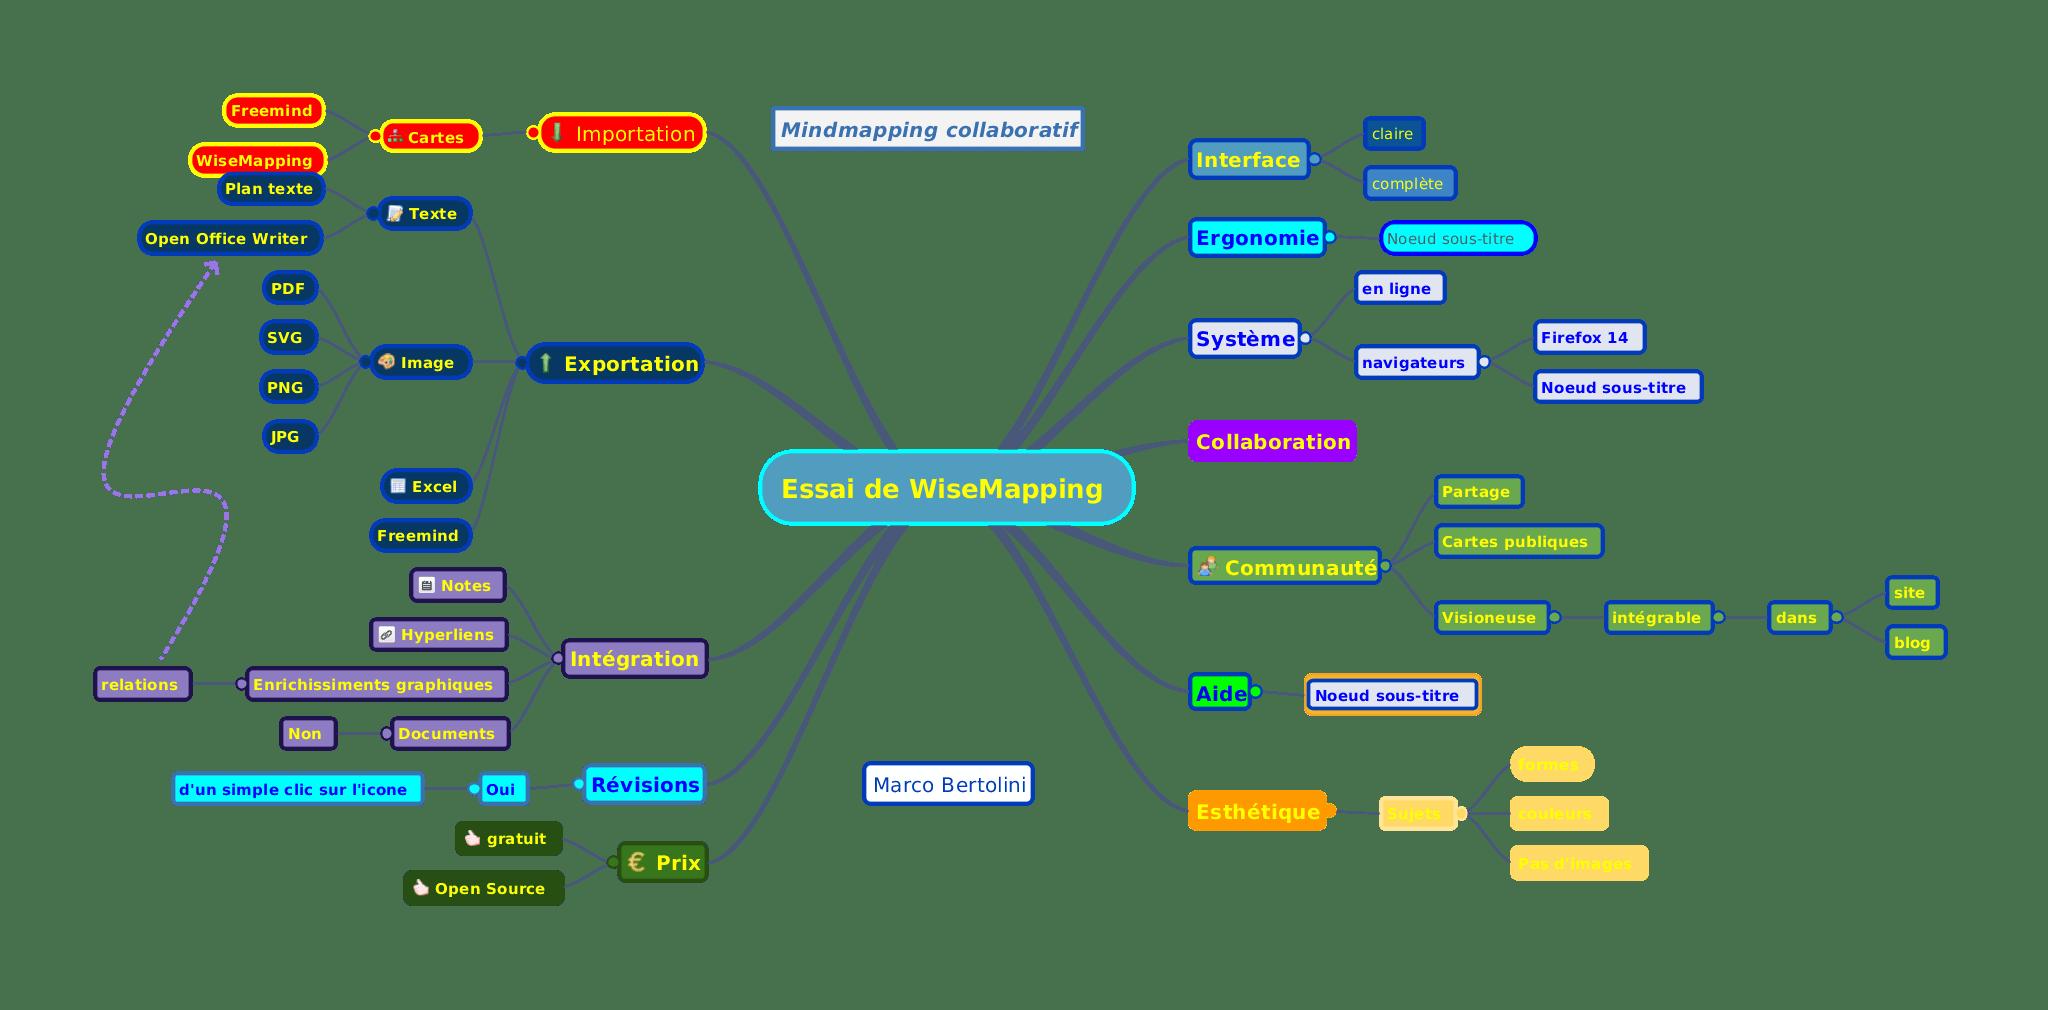 Wisemapping Du Mindmapping Collaboratif Gratuit Et Open Source Formation 3 0